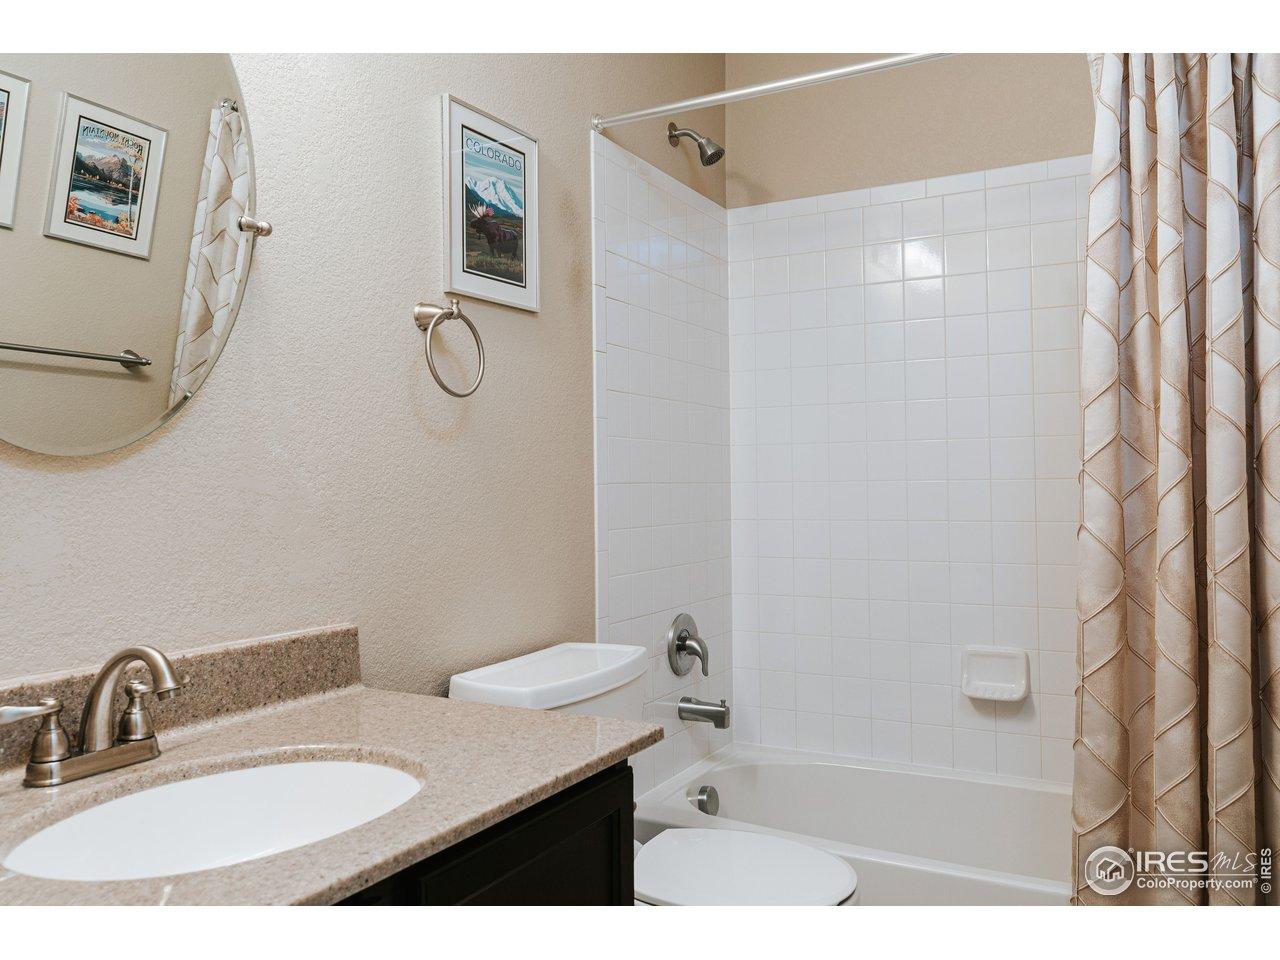 Main bath w/ tiled floors & granite vanity